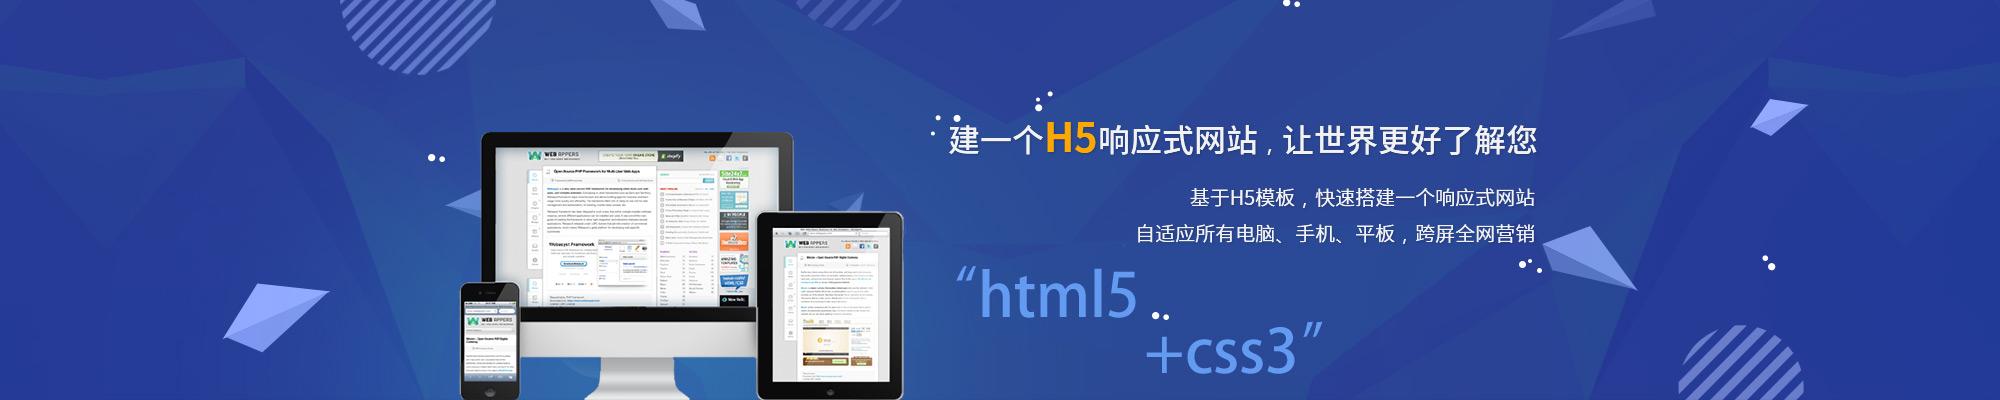 H5建站,H5设计,网页设计,网站定制,定制建站